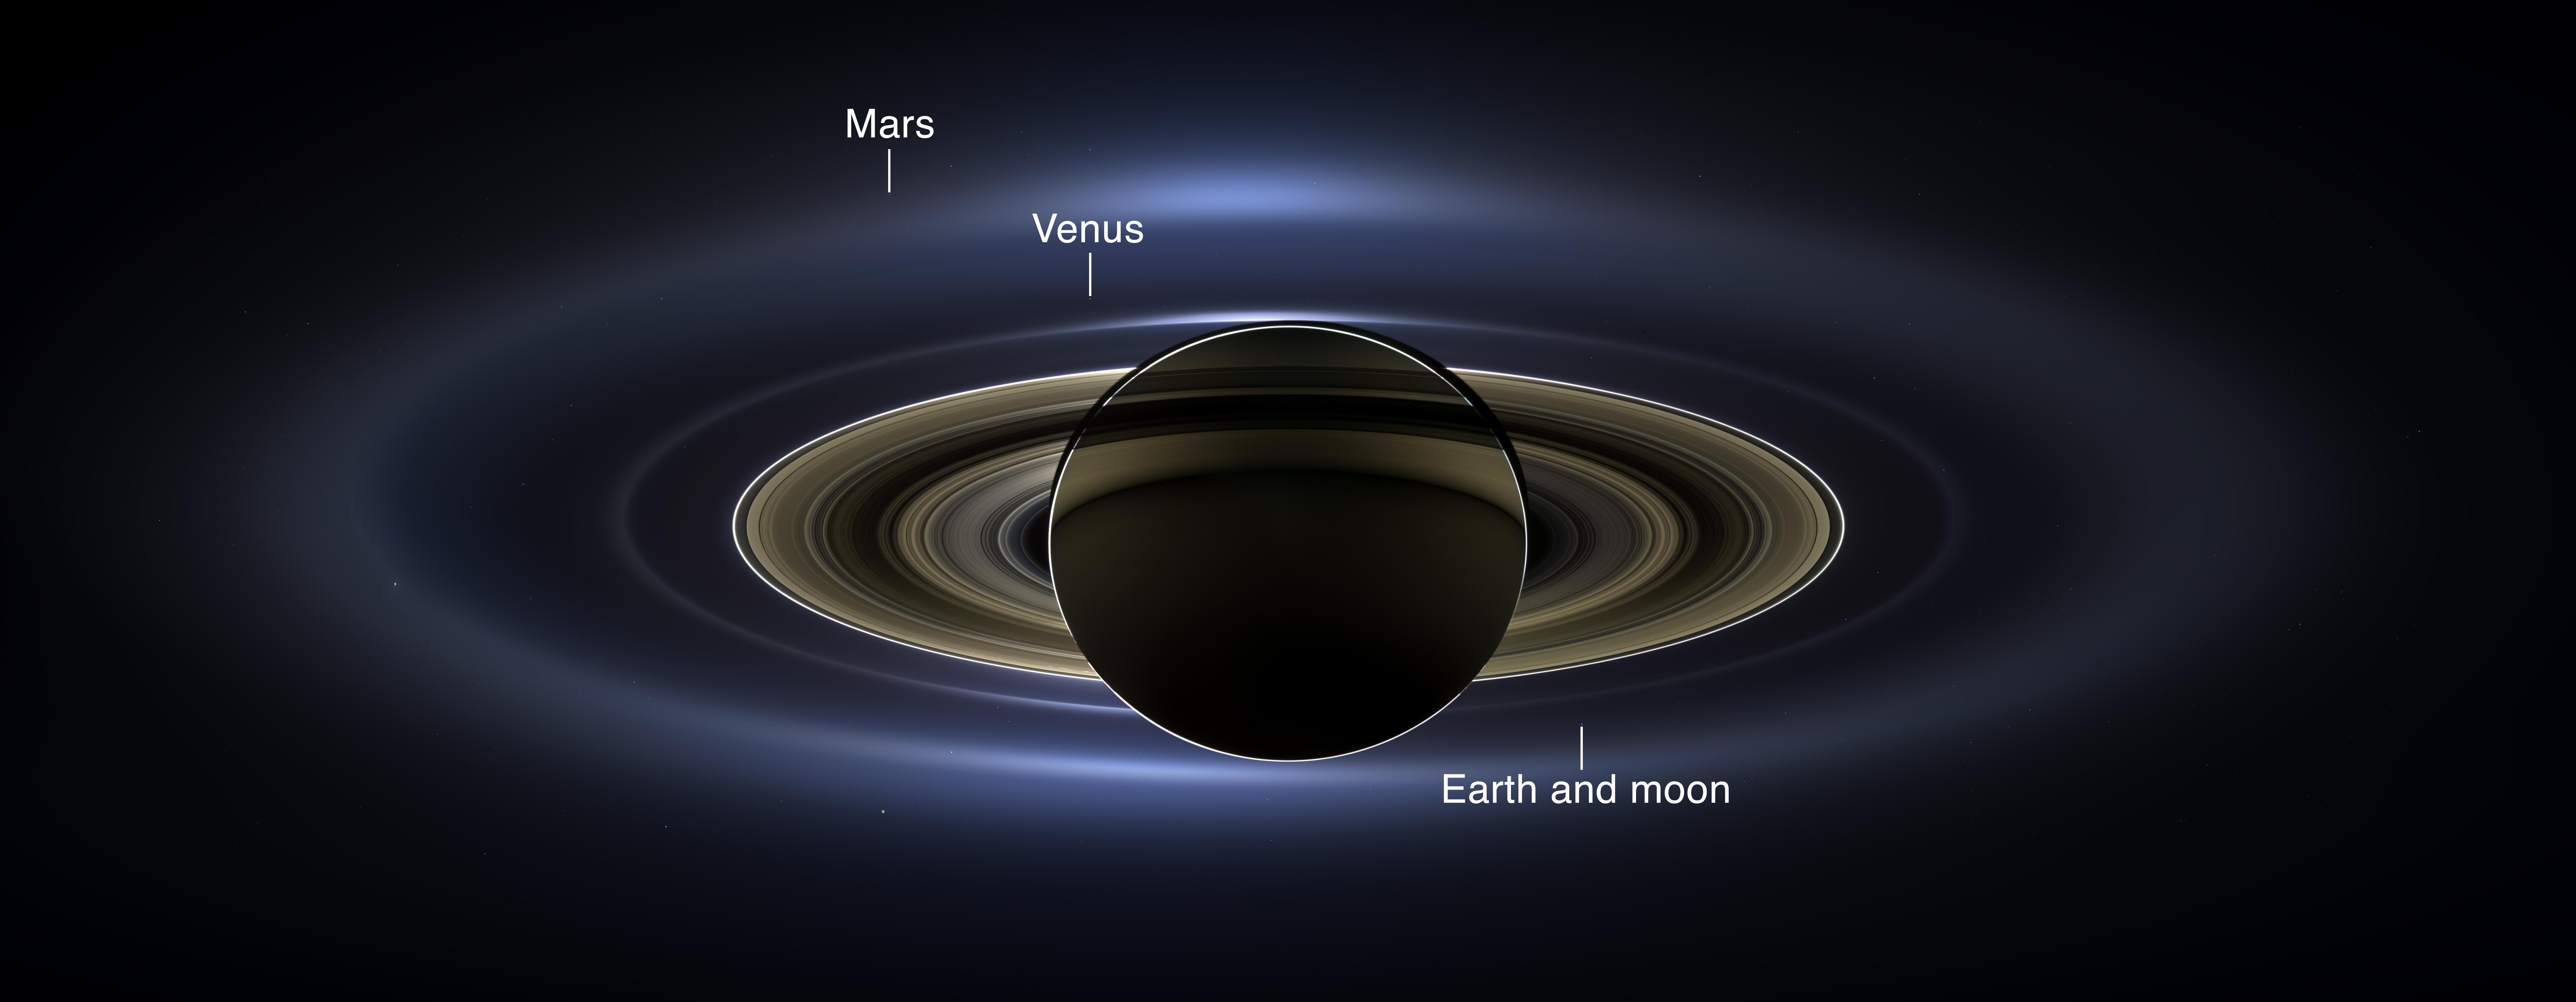 Saturn, Earth Shine in Amazing New Photo by NASA Probe